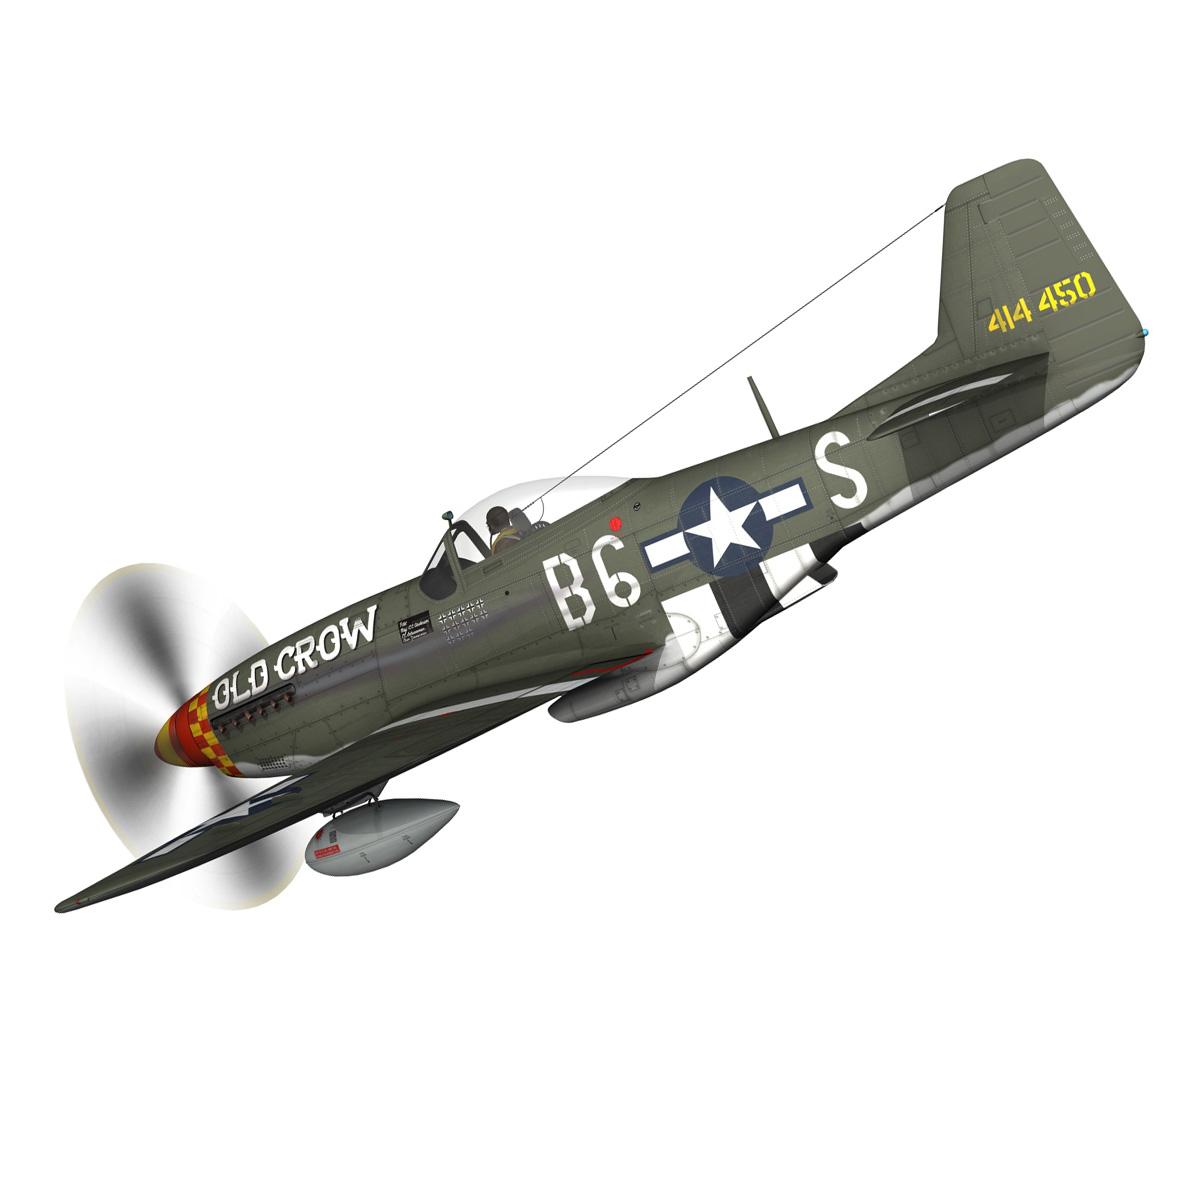 north american p-51d mustang – old crow 3d model fbx c4d lwo obj 273335